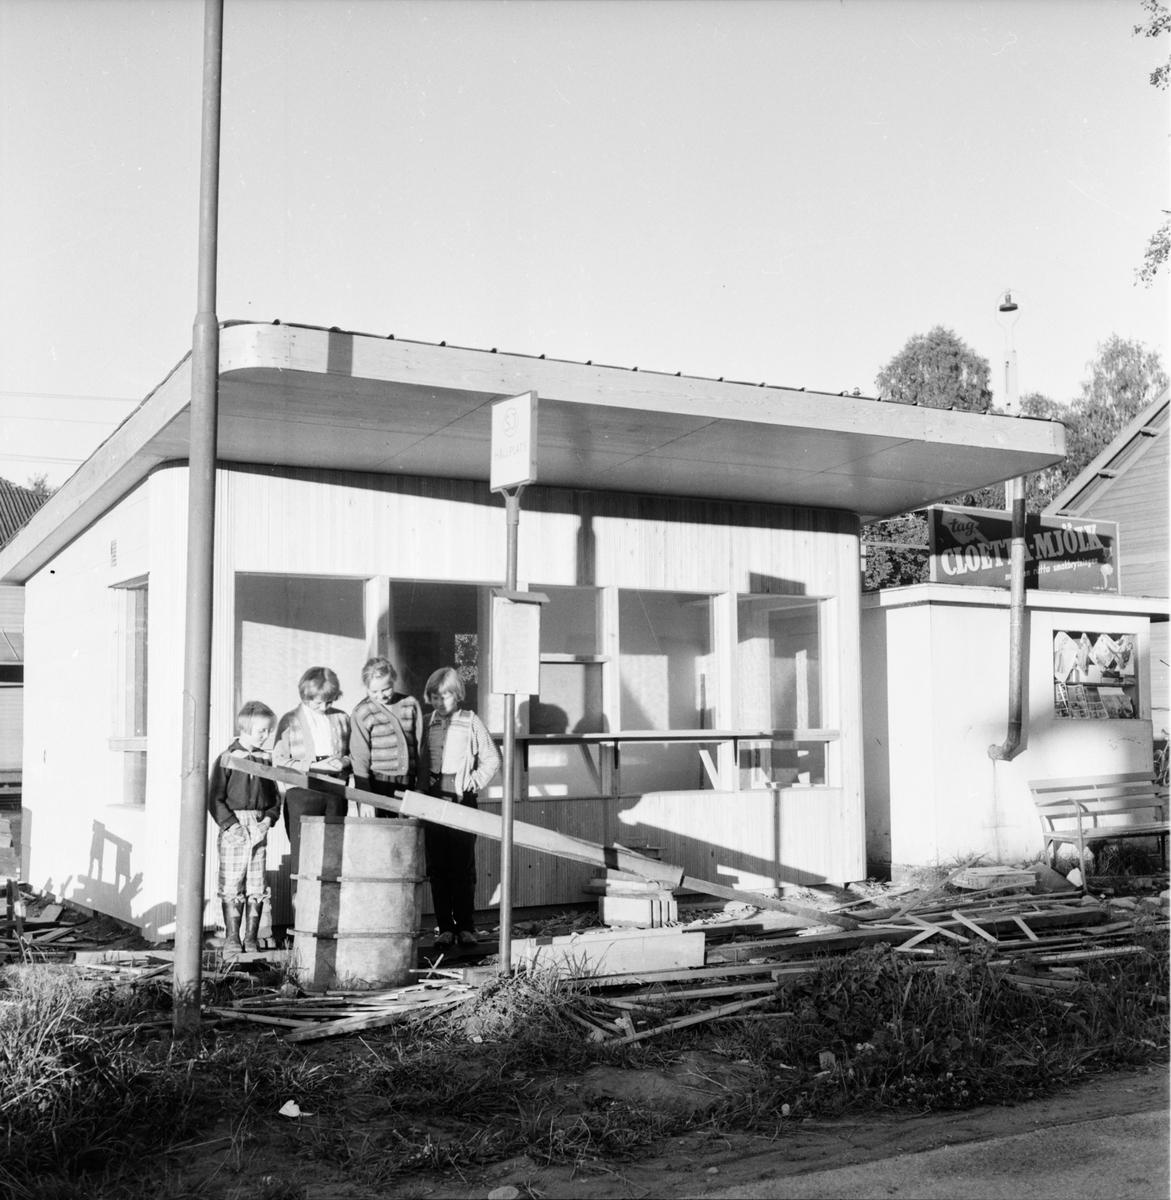 Samhället Stationen Stora huset Kiosken